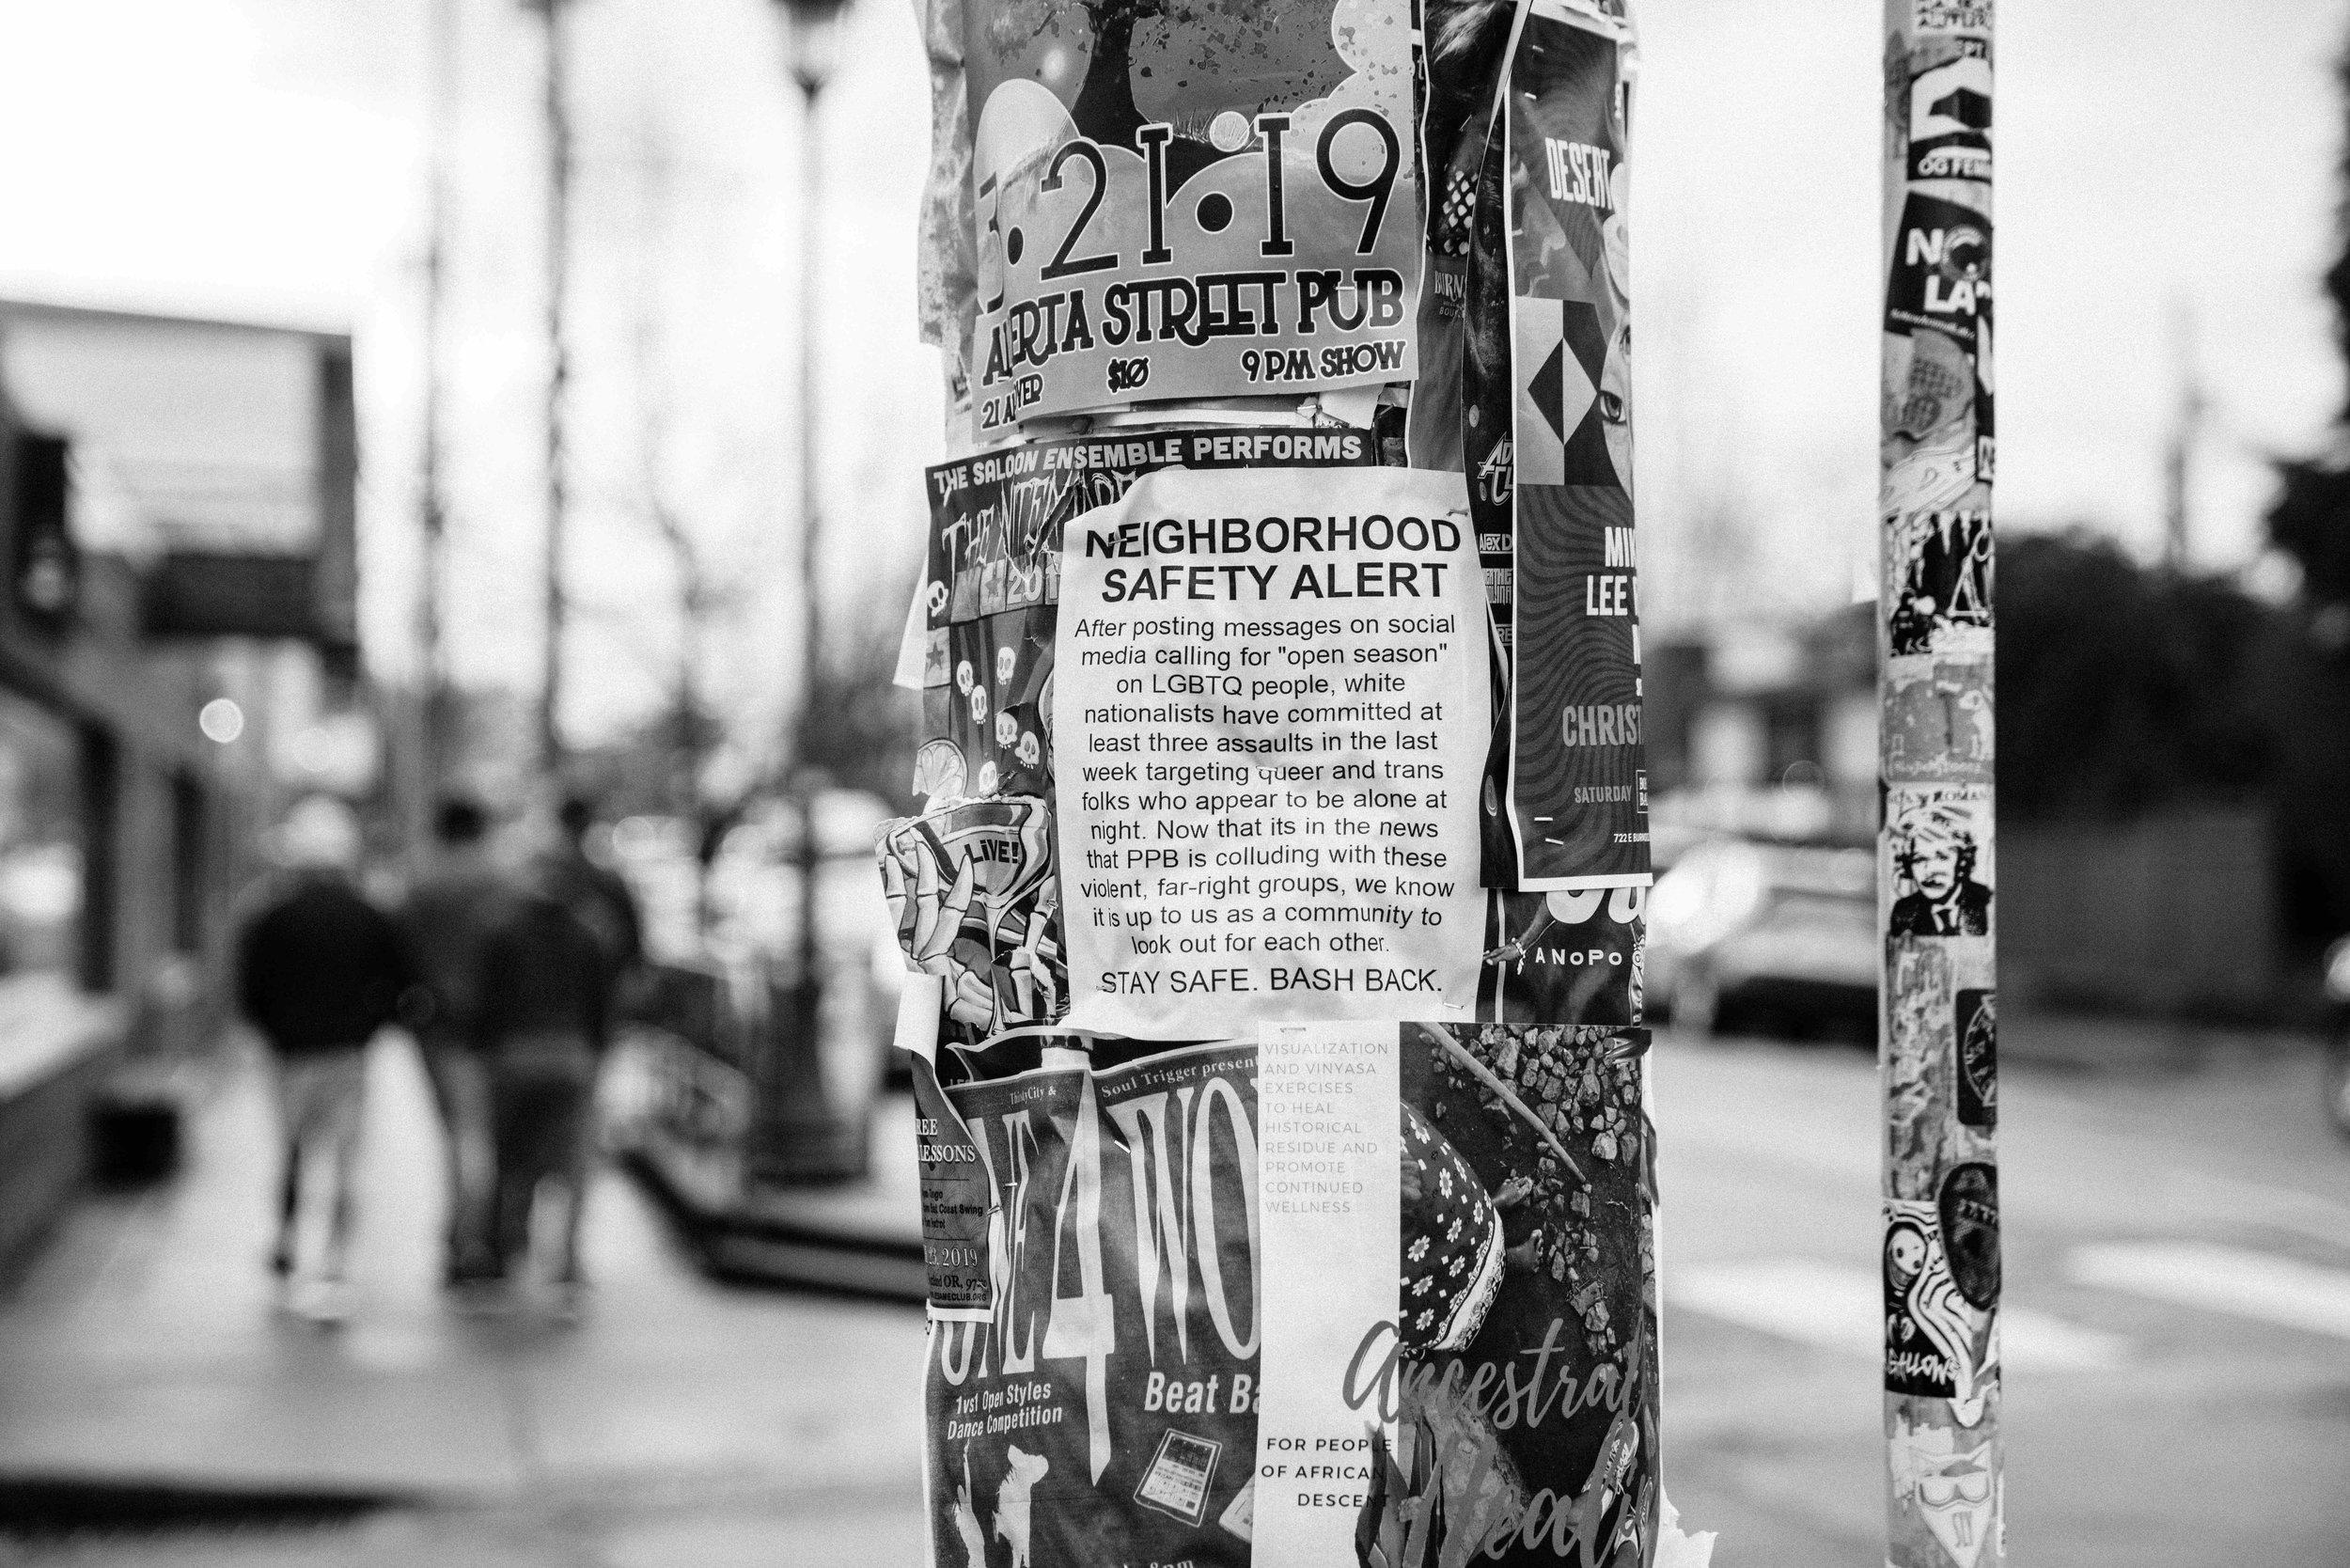 culture-crush-josue-rivas-lgbtq-safety-sign.jpg